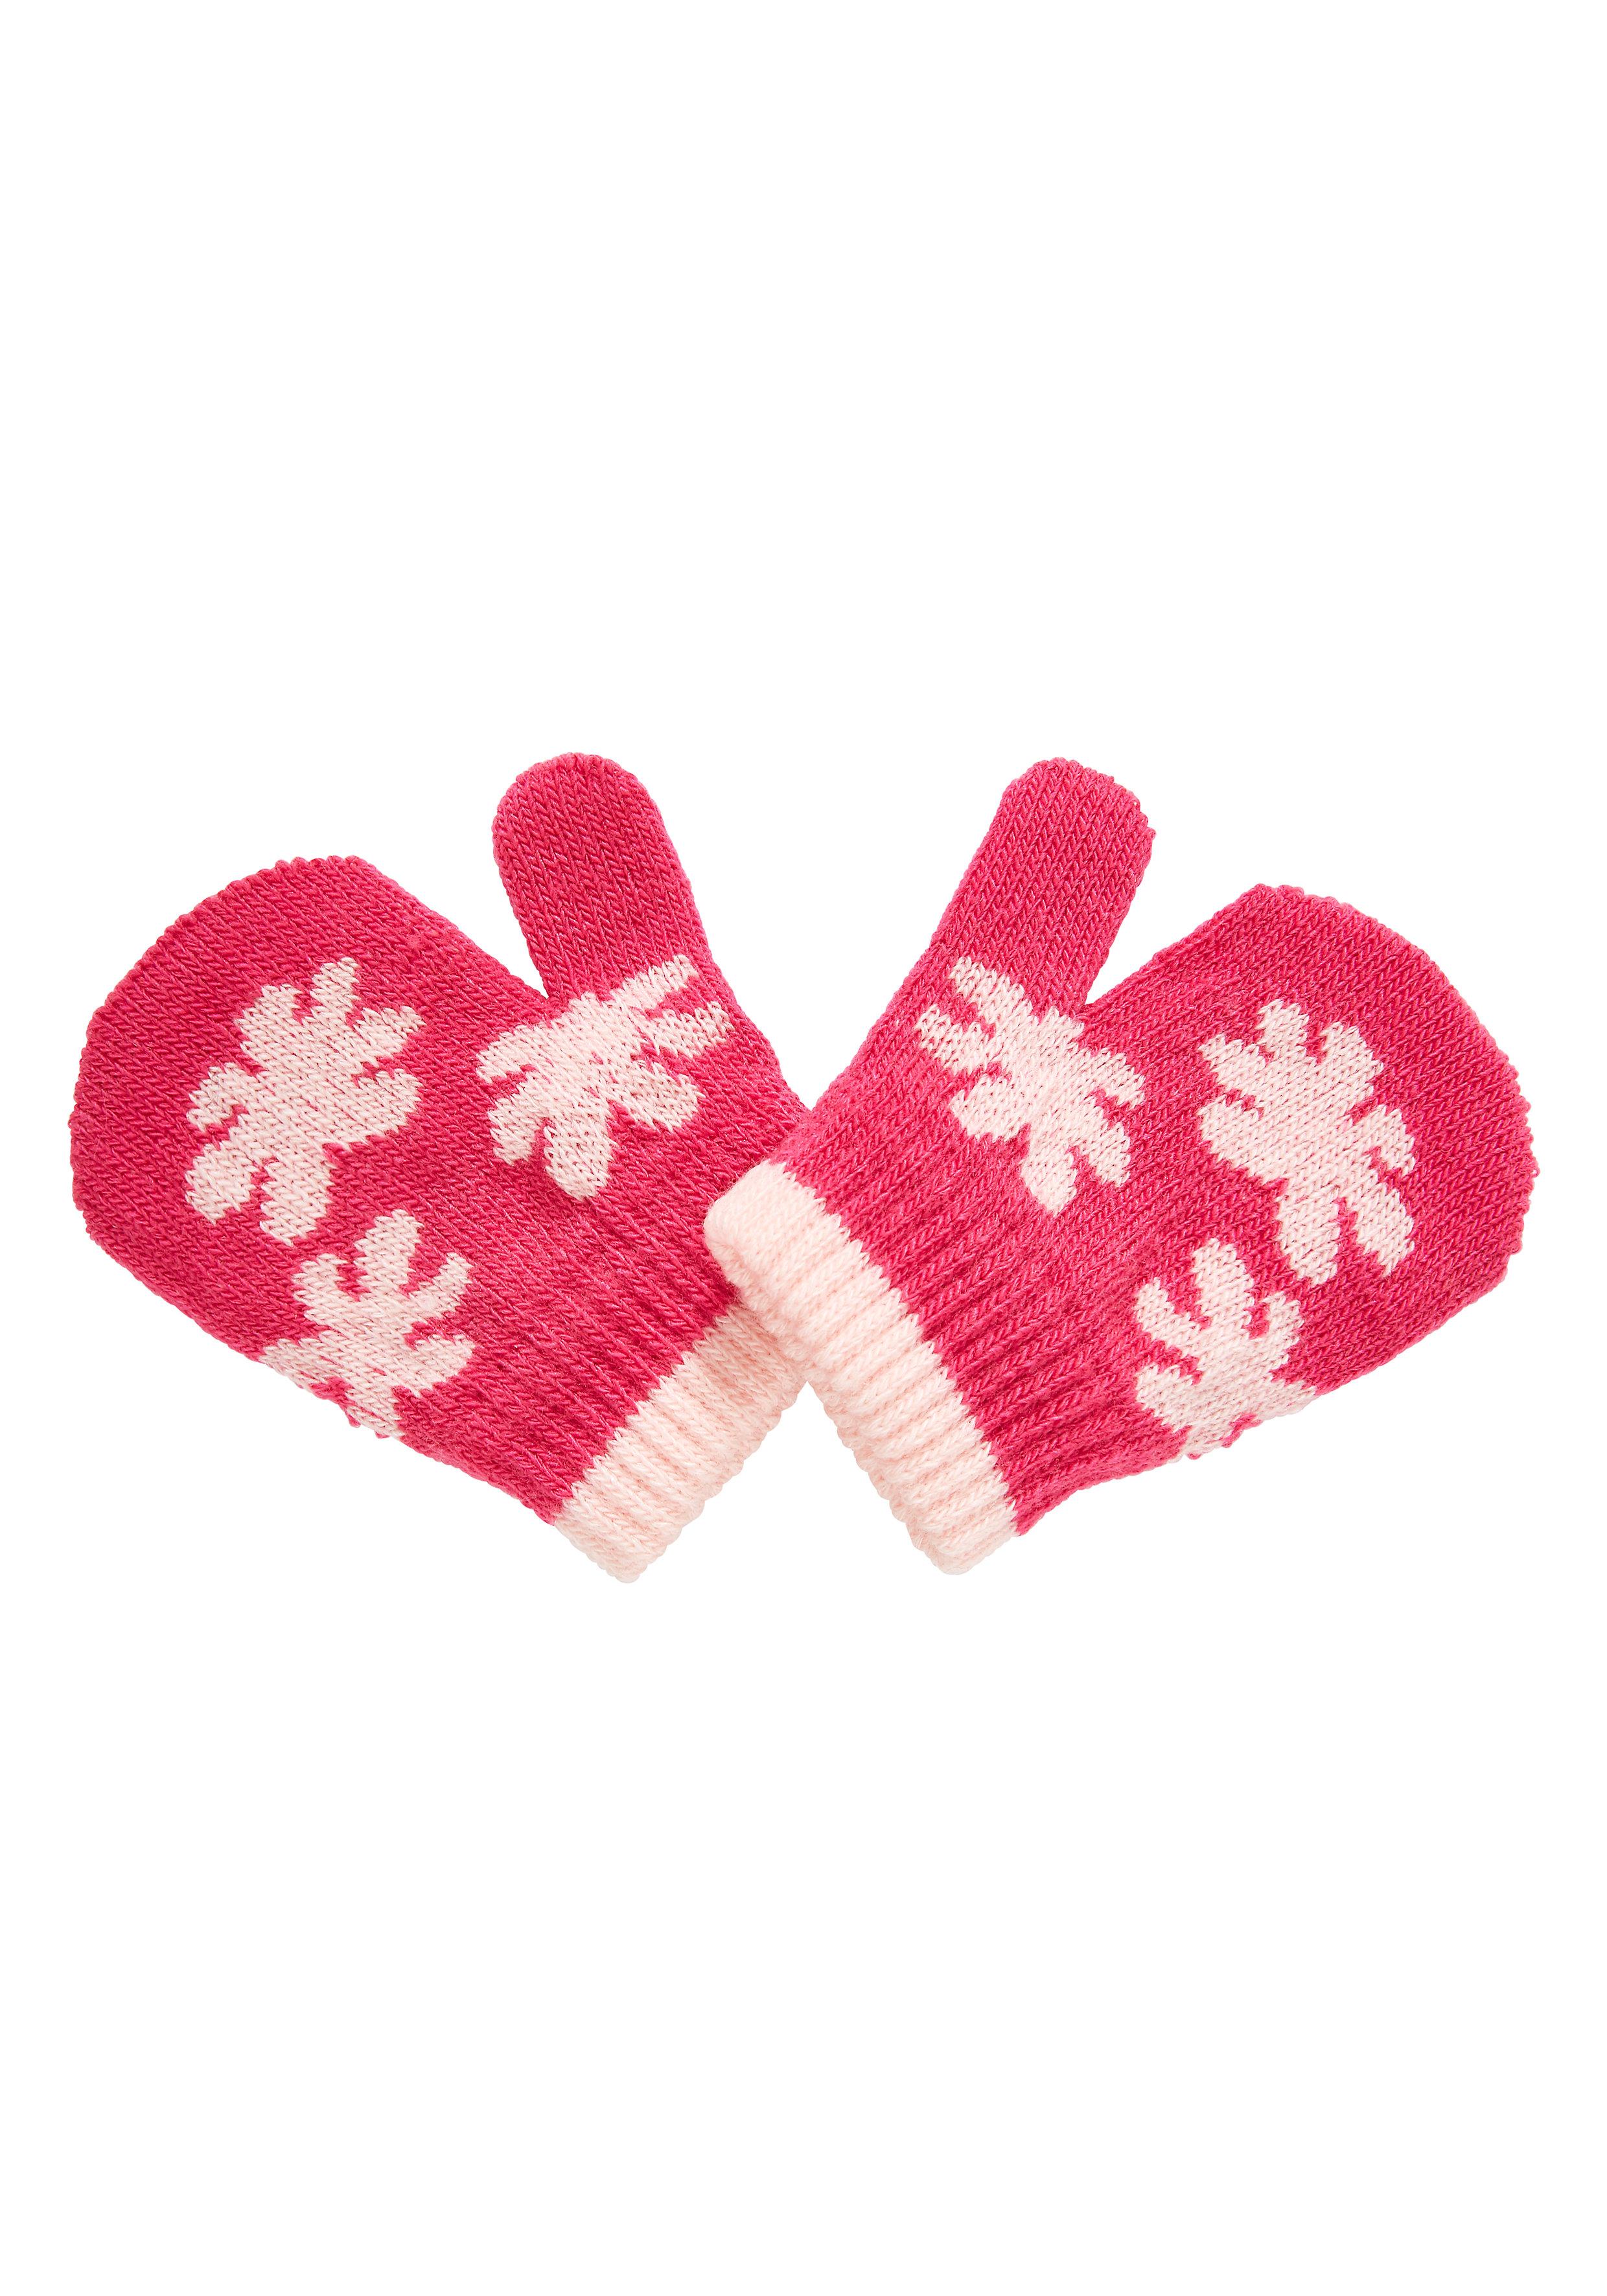 Mothercare | Girls Mittens Flower Design - Pink